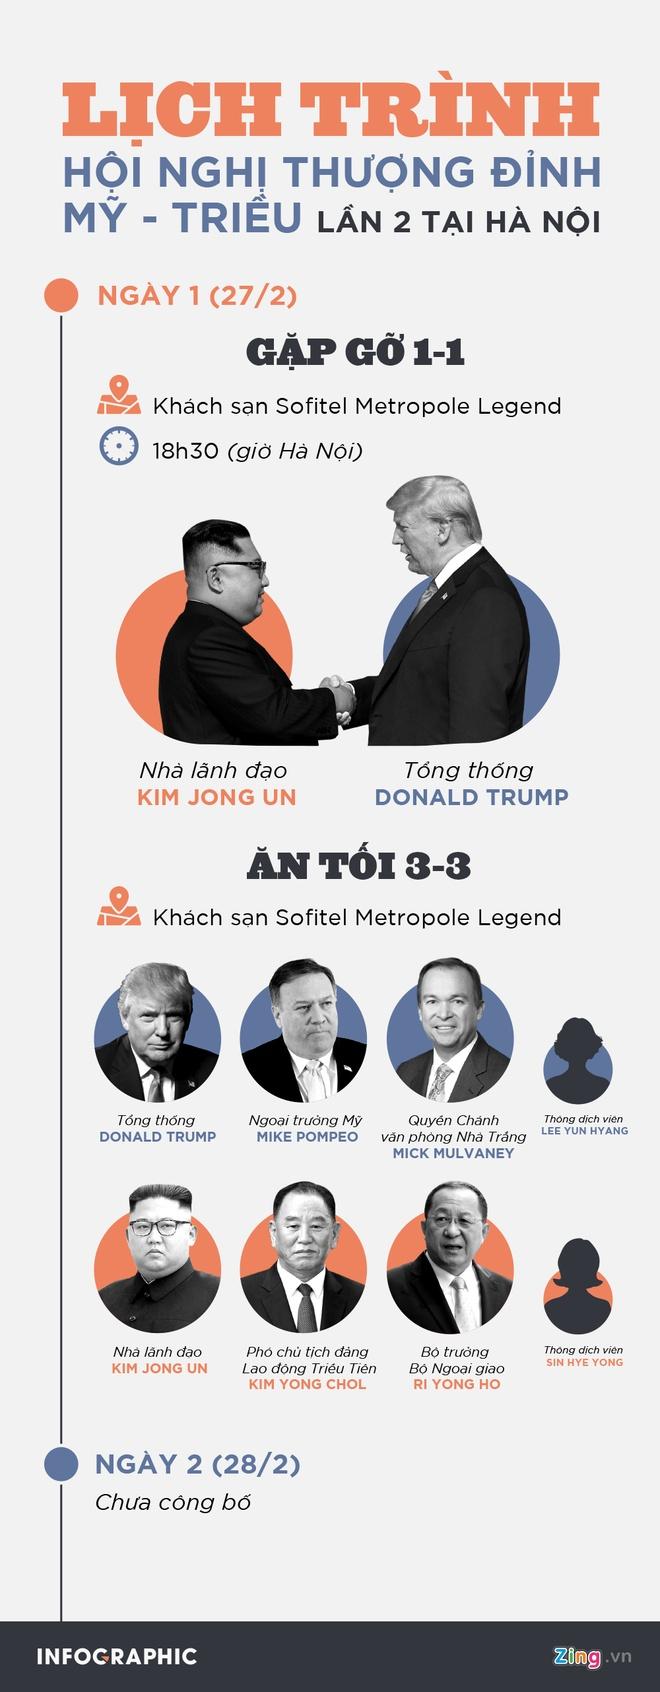 Chu tich Kim: 'Quyet dinh chinh tri day dung cam cua ong Trump' hinh anh 17